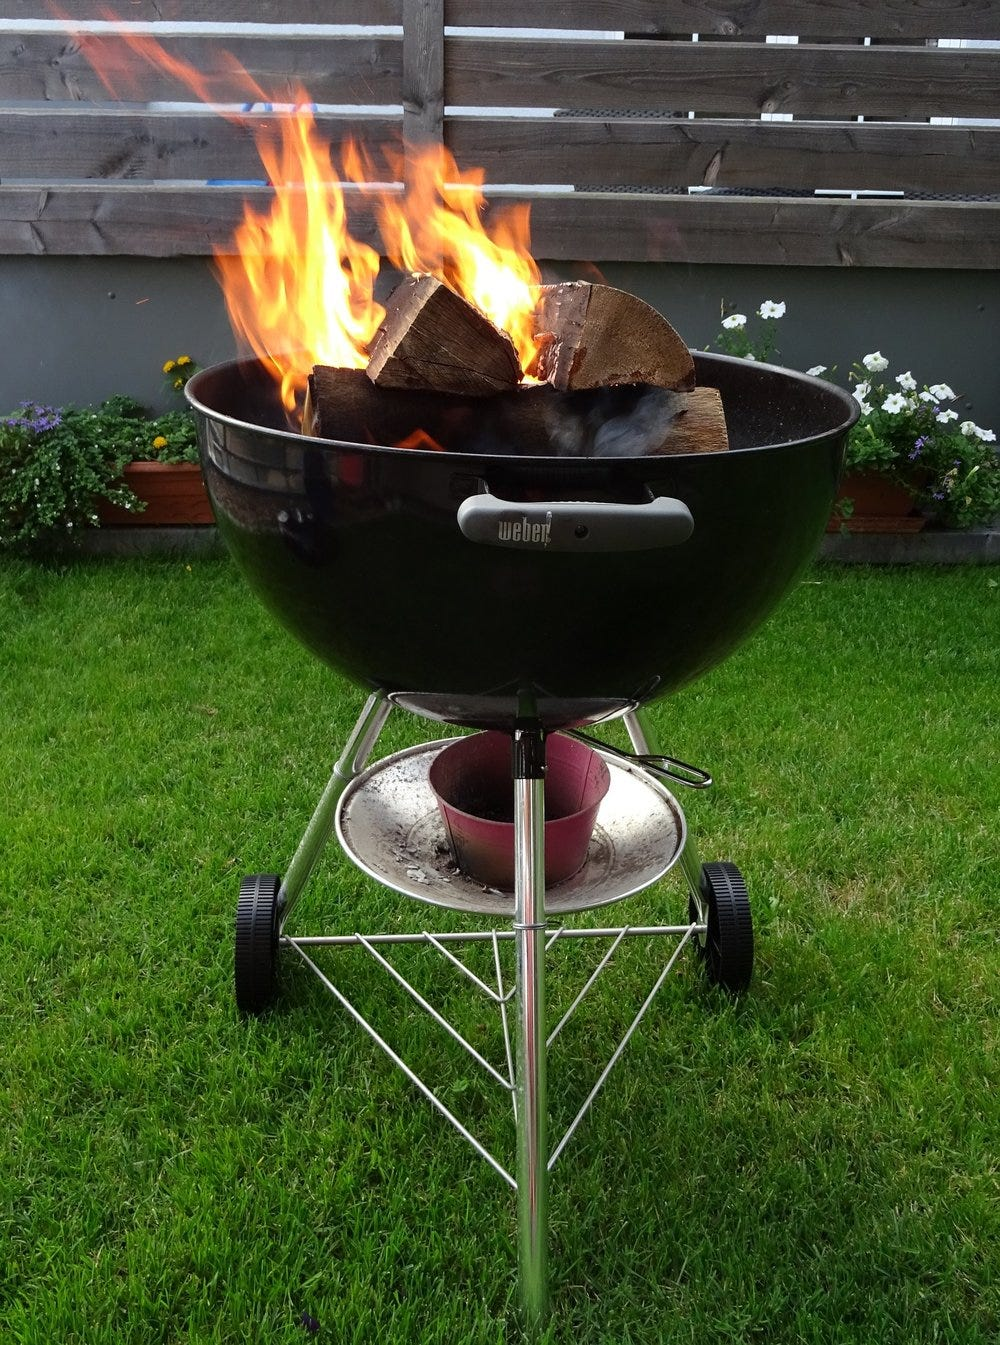 grill-1581118_1920.jpg